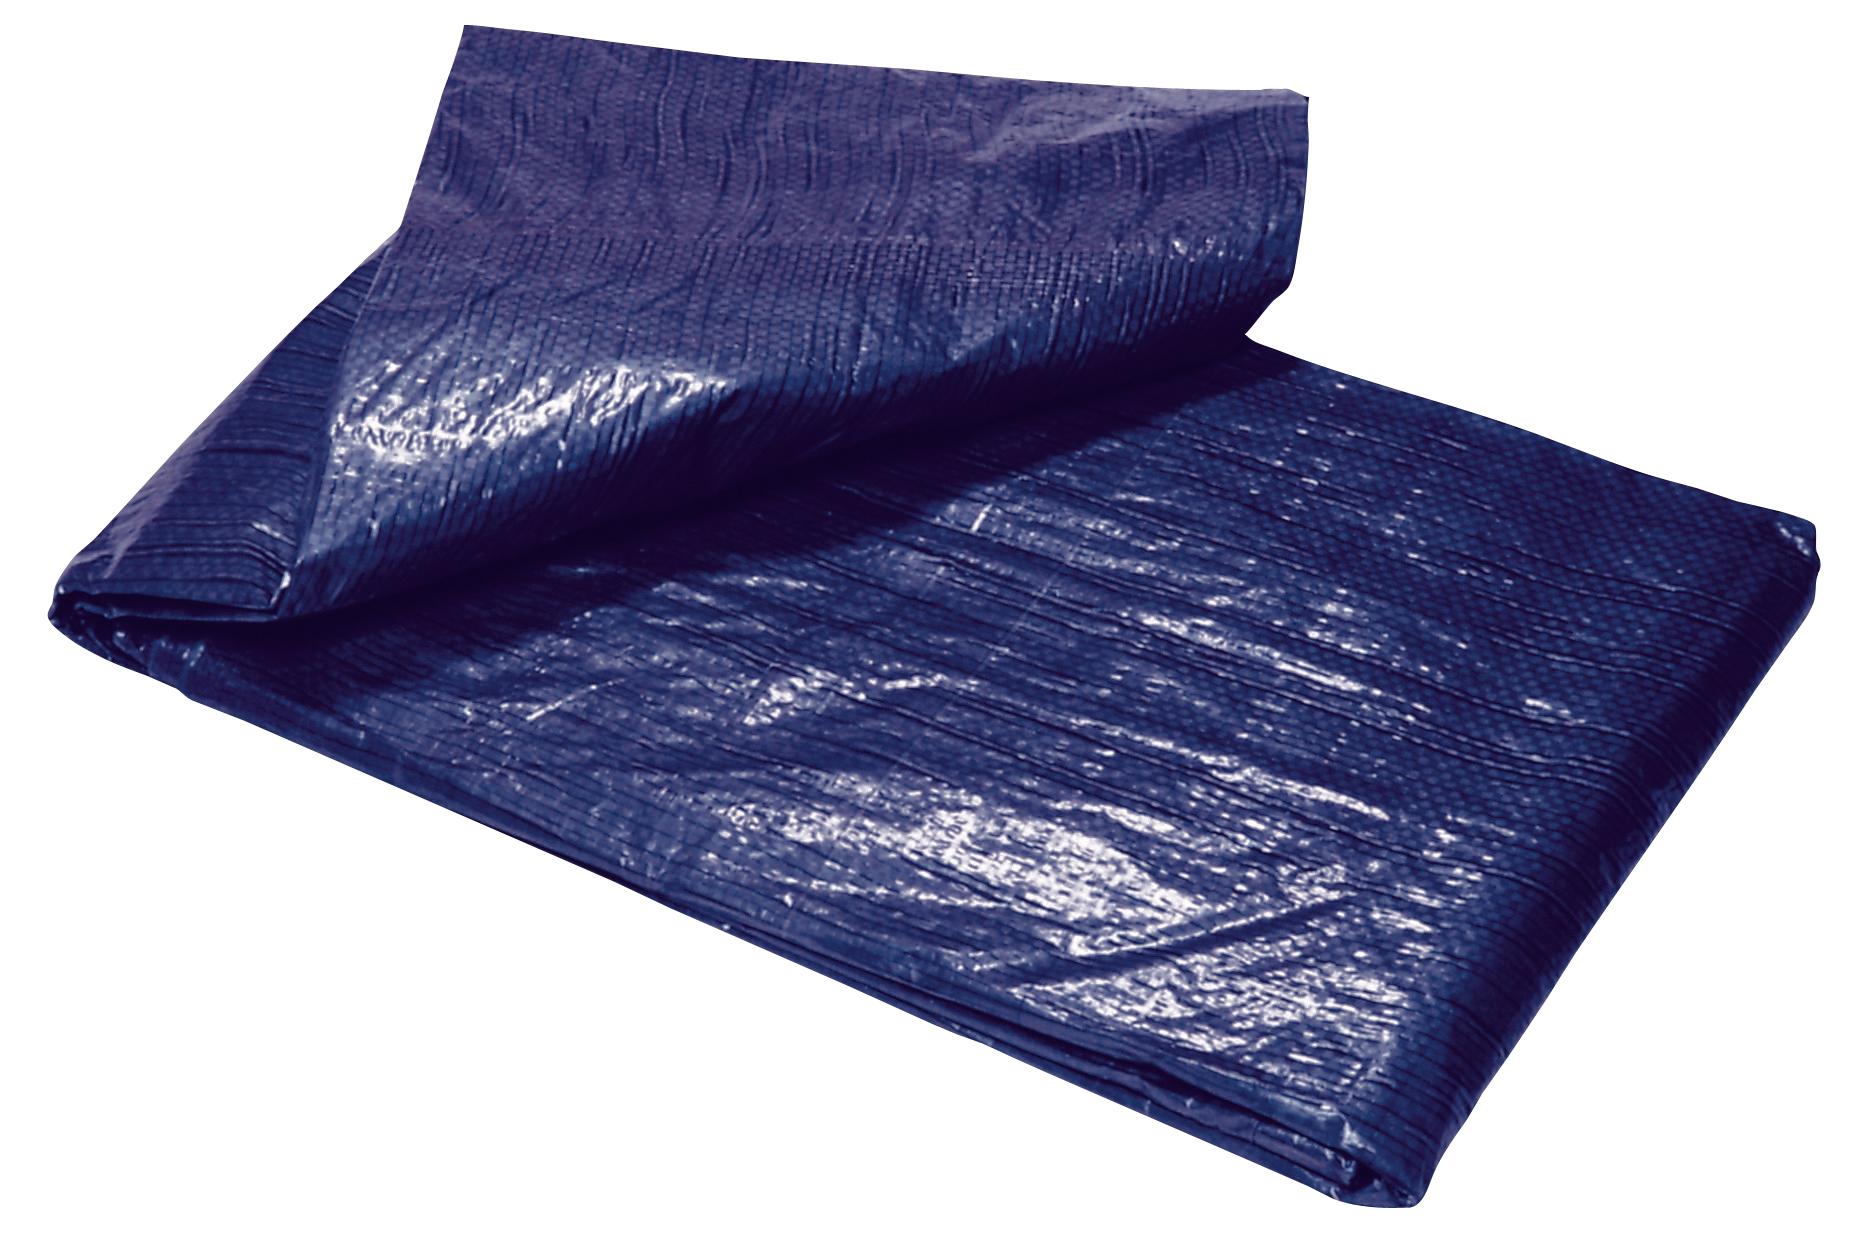 Plachta Tarpaulin Standard 10x15, prekrývacia, 80 g/m2, modrá